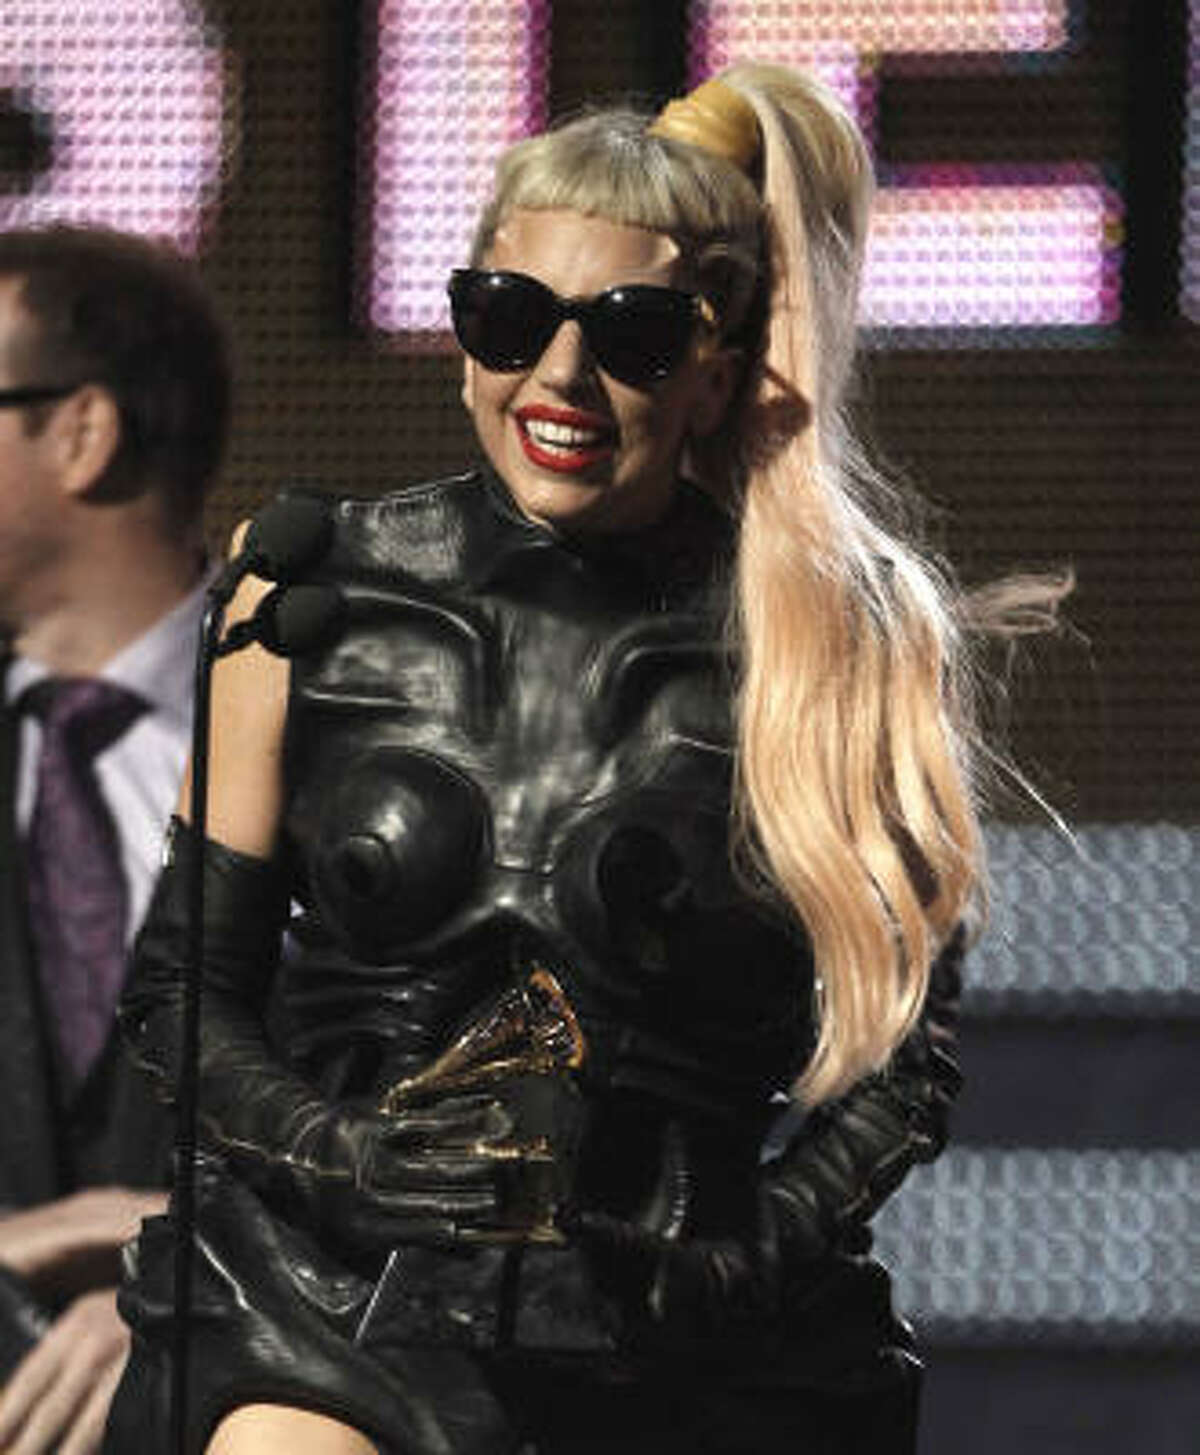 Lady Gaga Best Female Pop Vocal Performance, Best Pop Vocal Album, Best Short Form Music Video